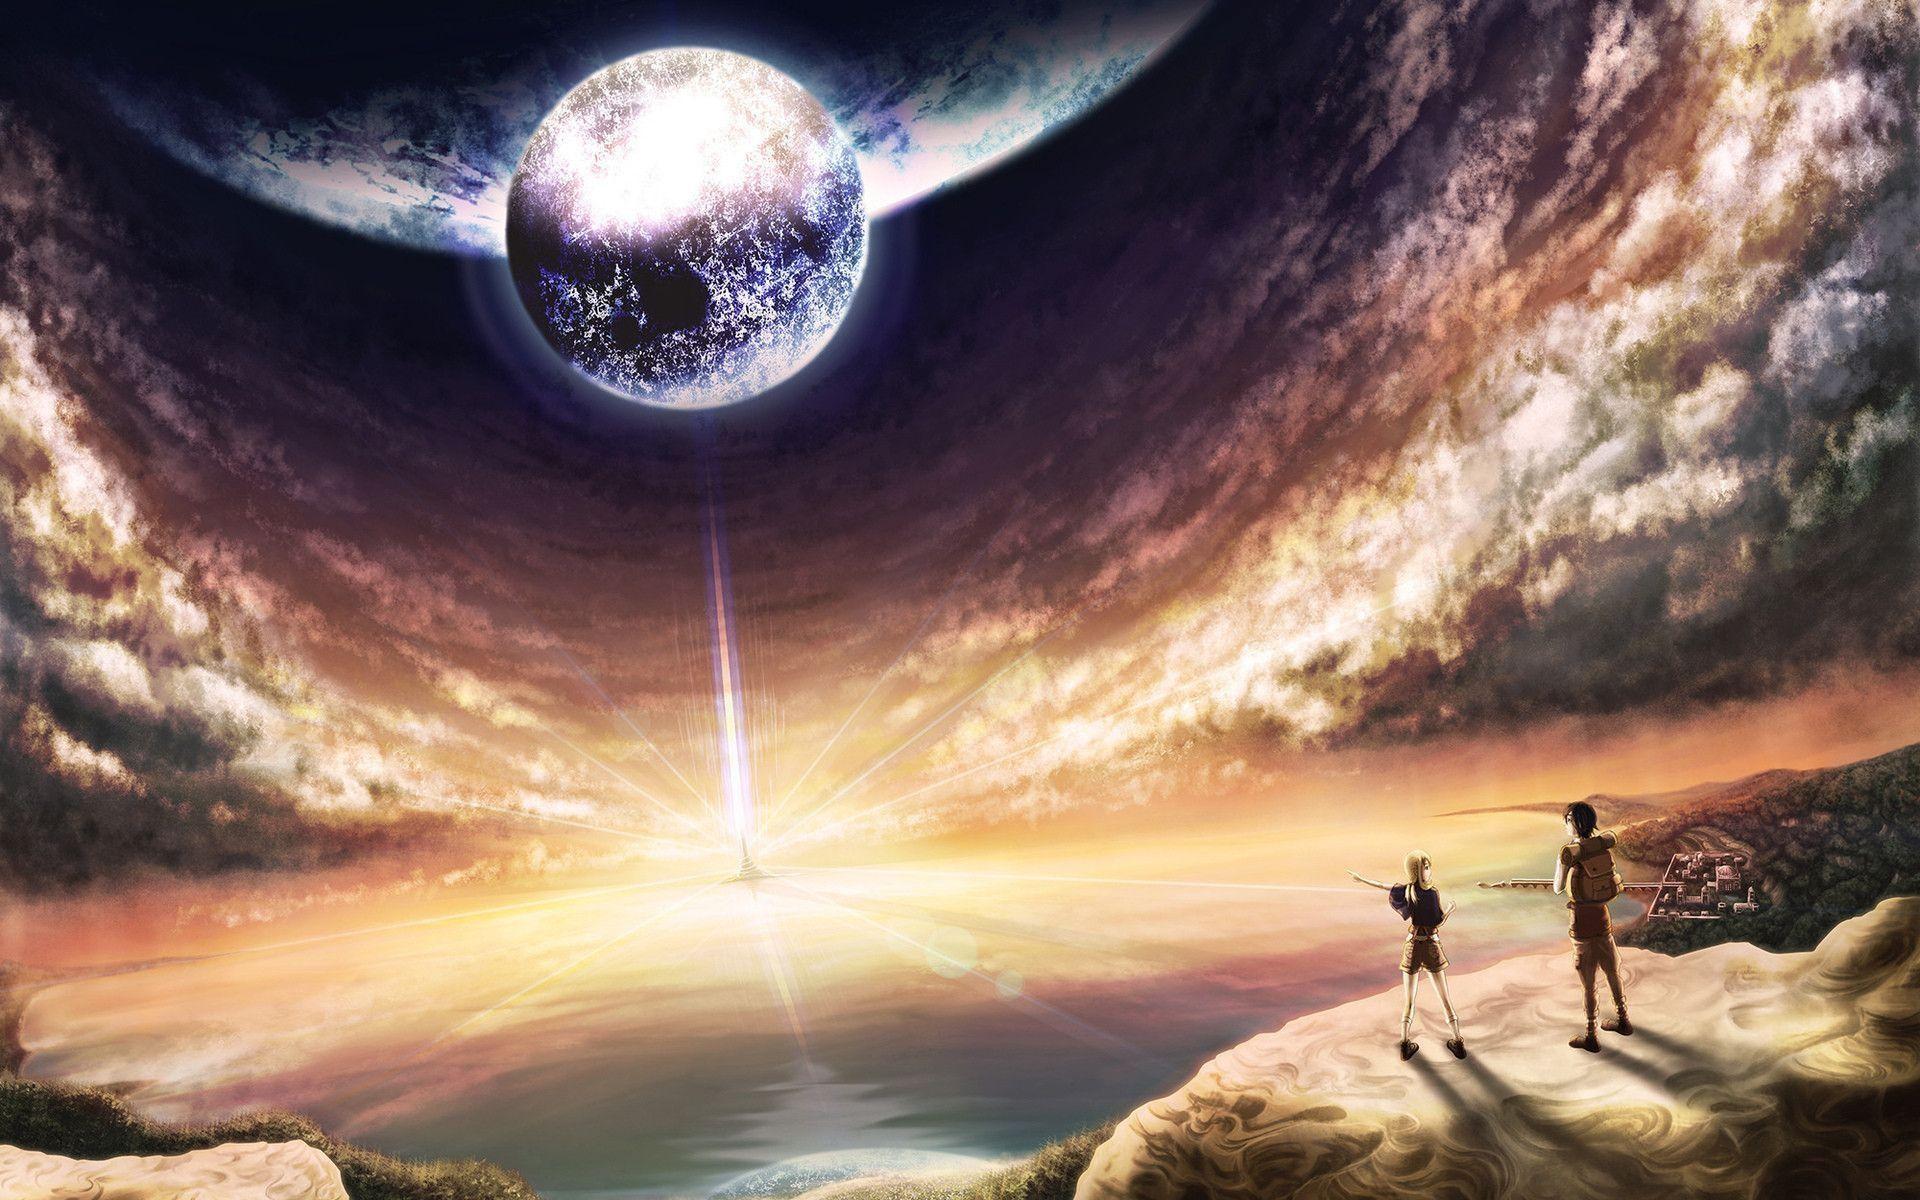 Res: 1920x1200, Fantasy World, Anime widescreen wallpaper | Wide-